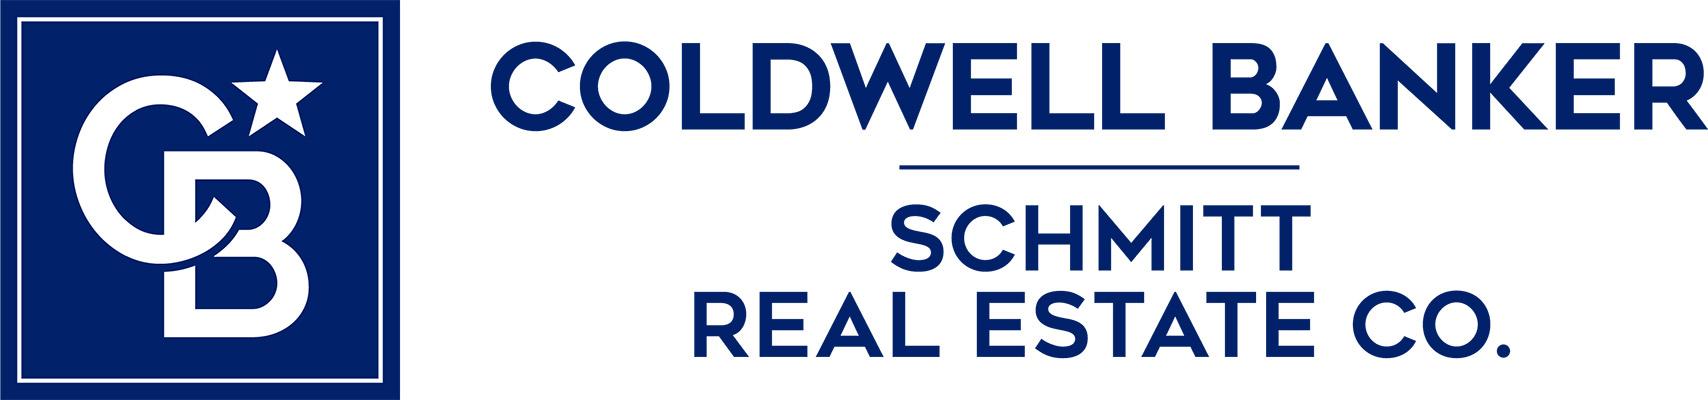 Thomas McLaughlin - Coldwell Banker Logo